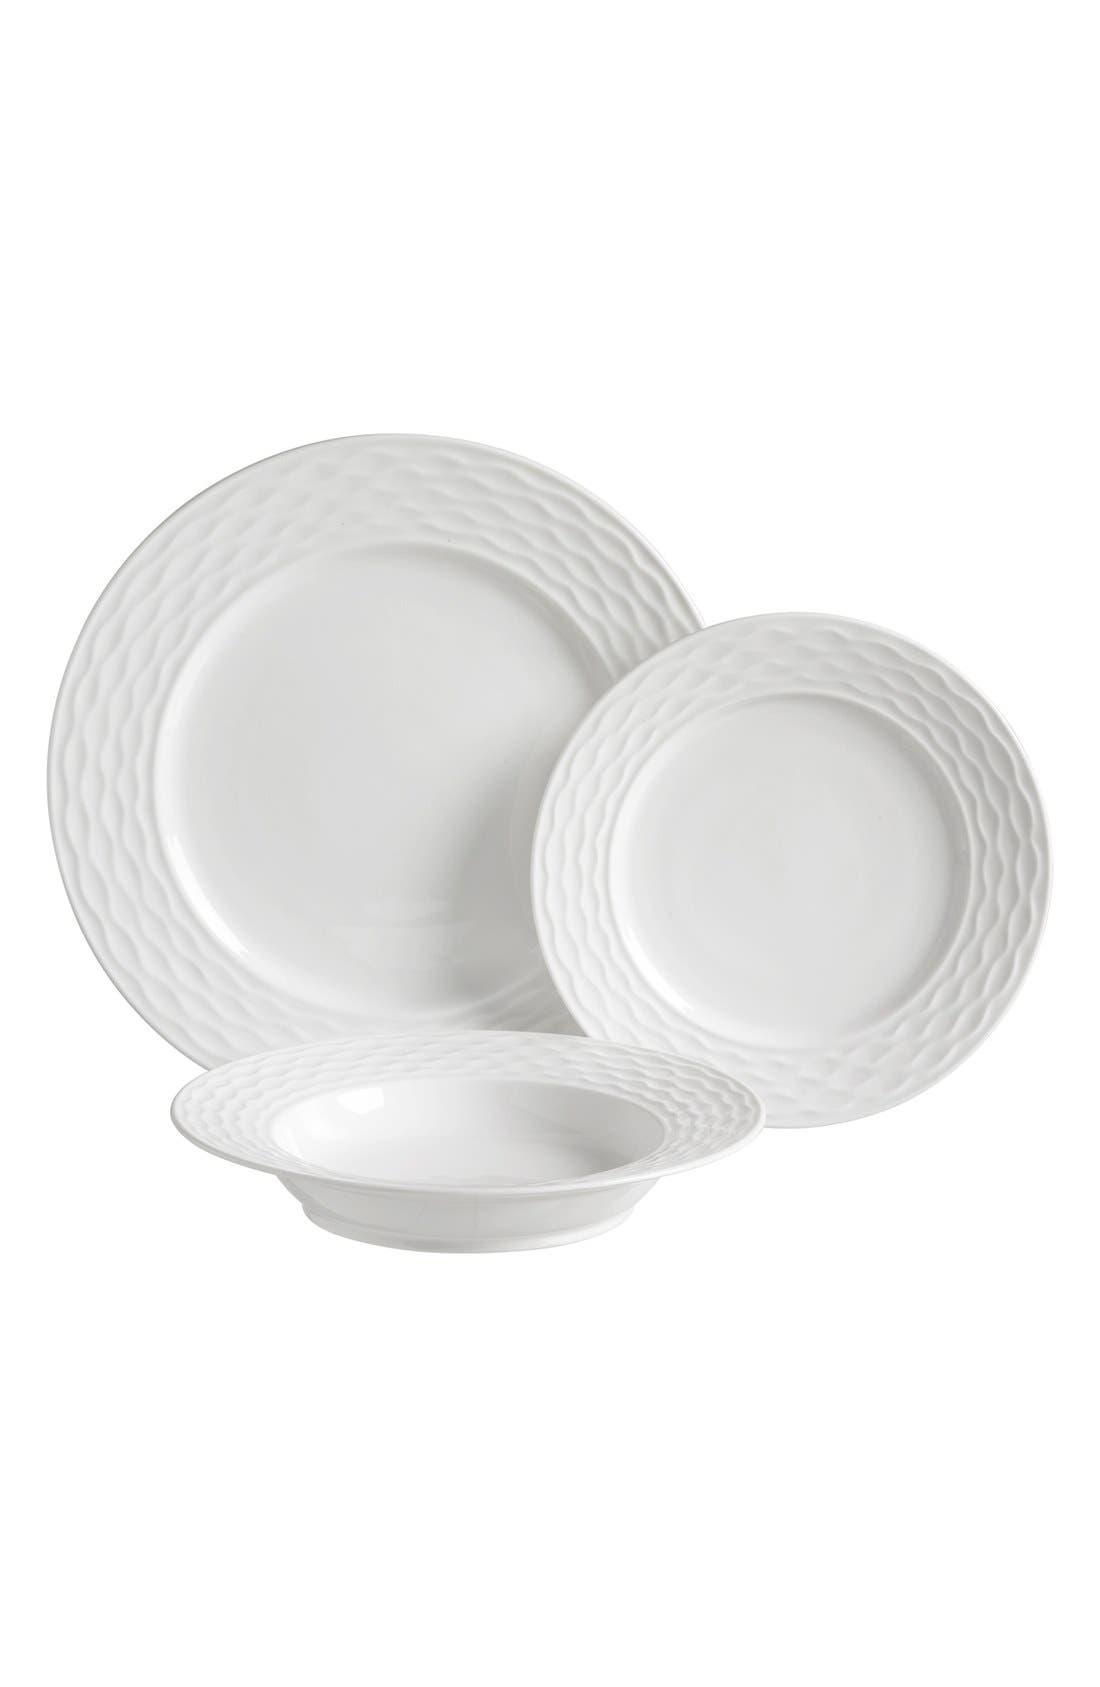 Main Image - Luigi Bormioli Porcelain Dinnerware (12-Piece Set)